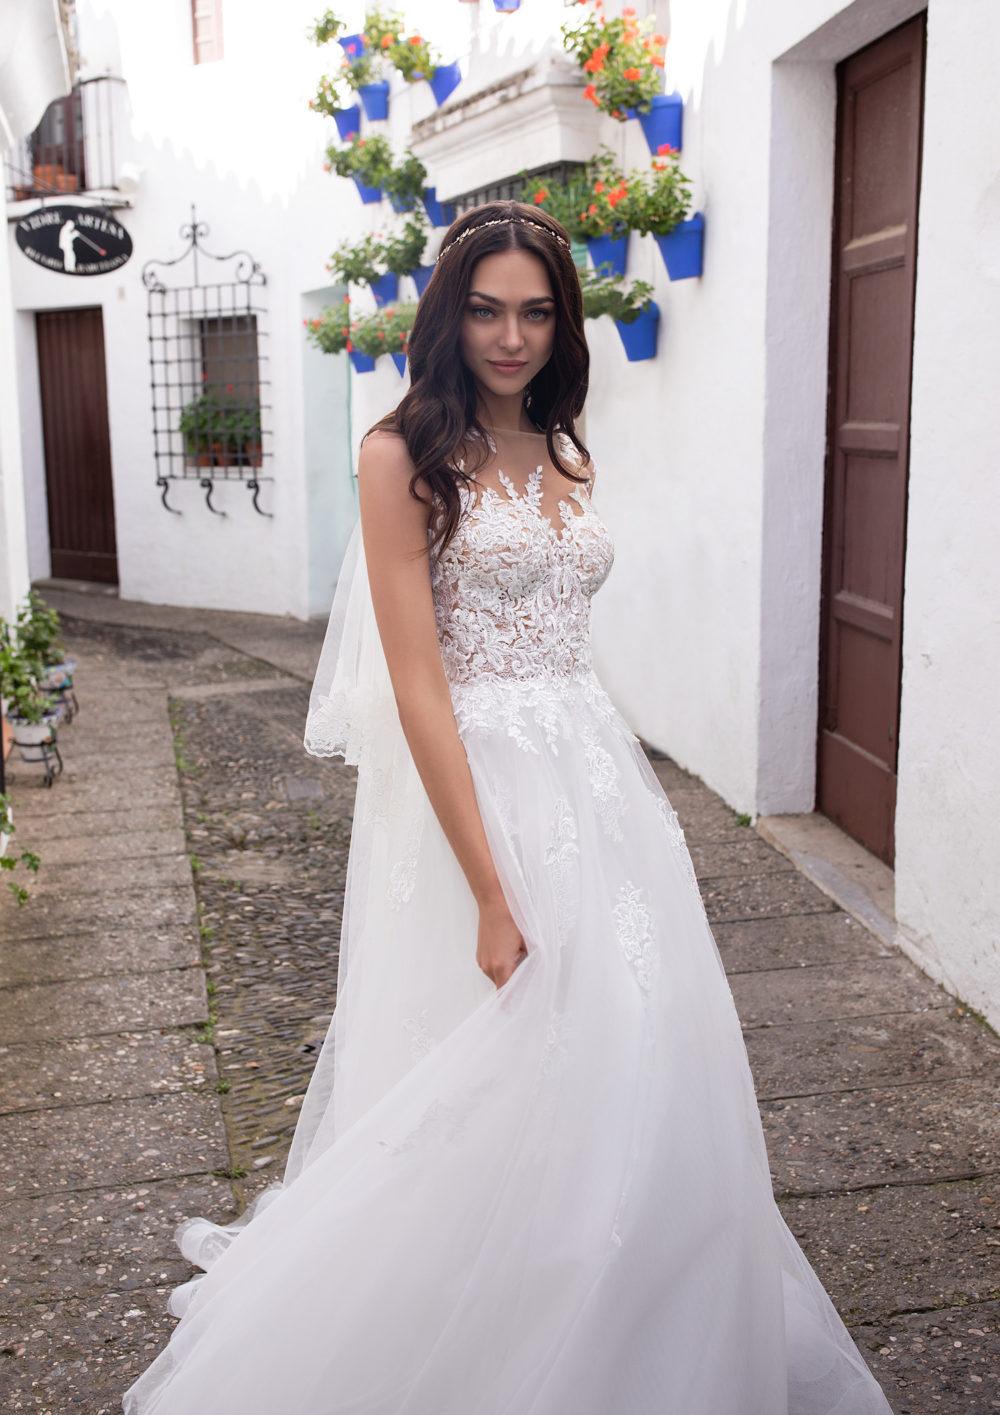 Mariages: abito da sposa Pronovias 2020 a Vicenza, Verona, Padova, Veneto GANYMEDE